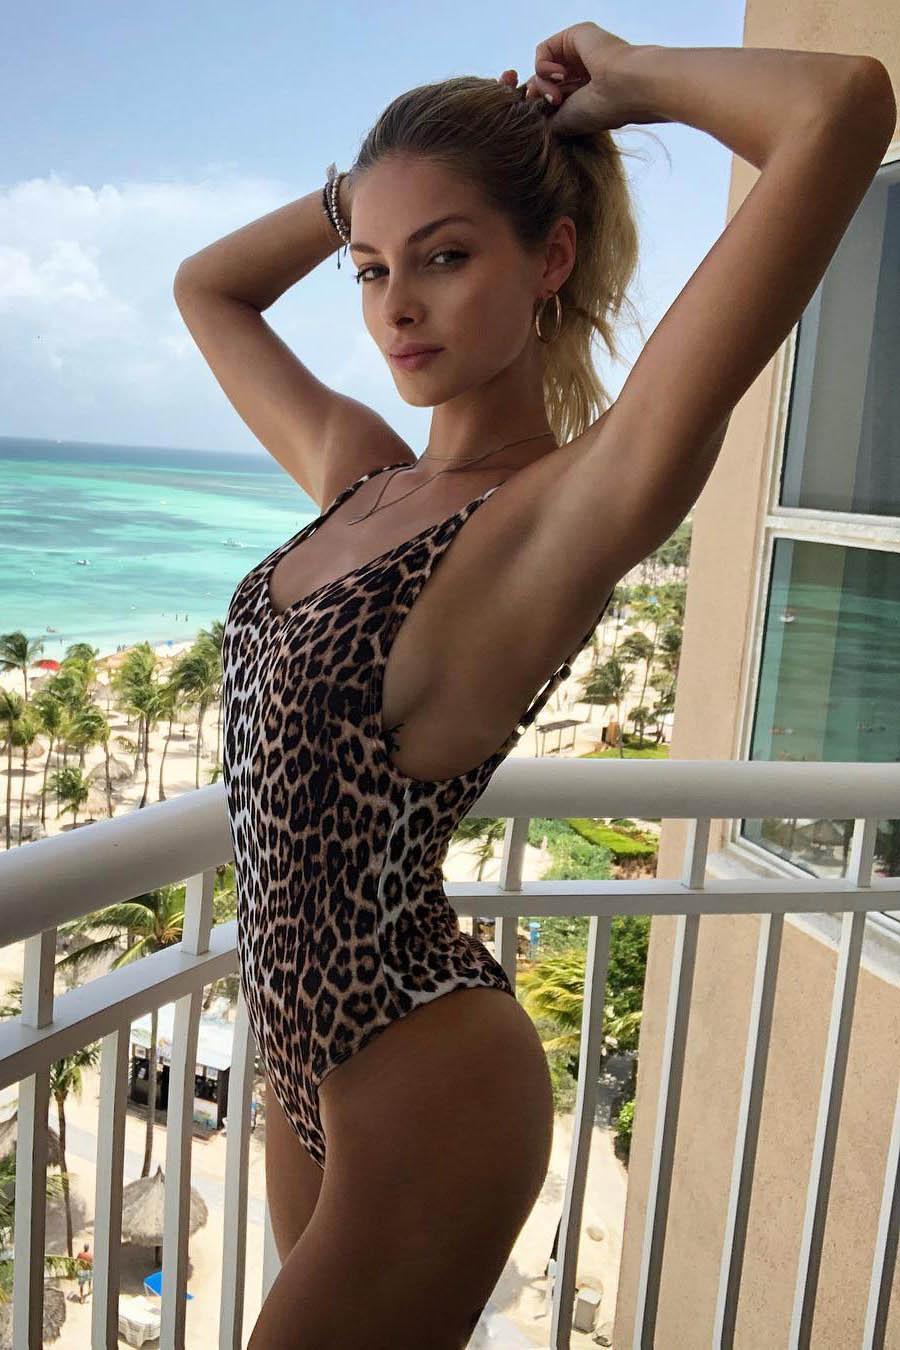 Uliana 18-year-old blonde